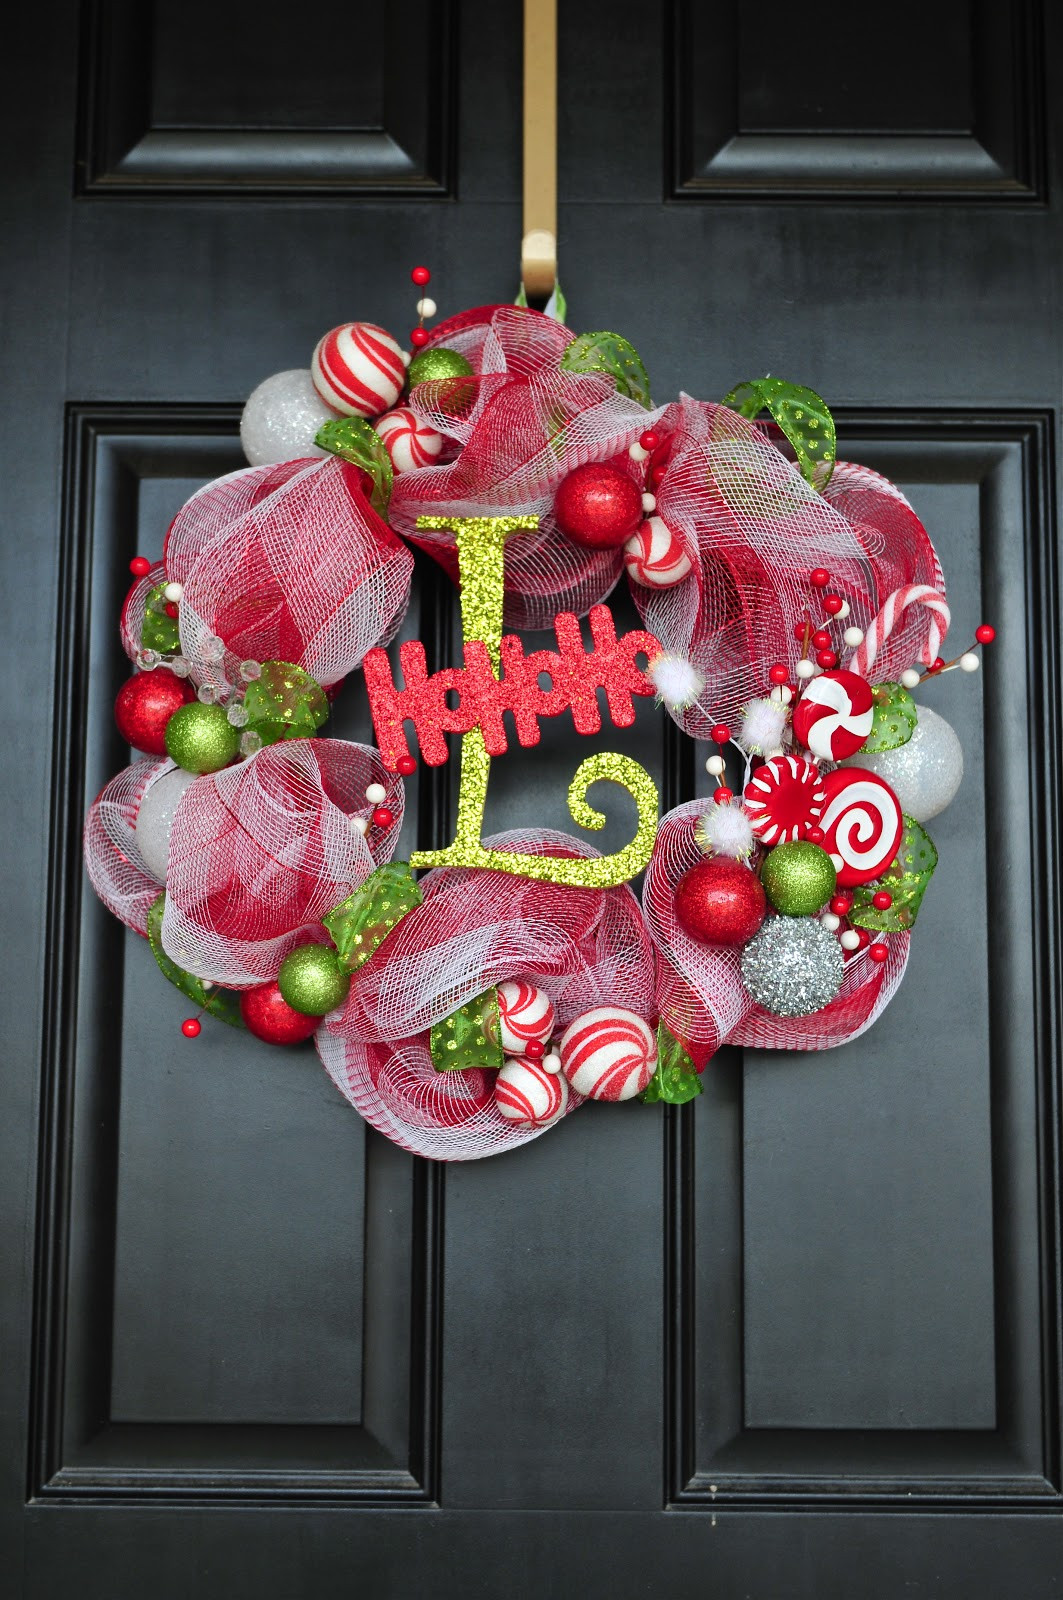 Best ideas about Easy DIY Christmas Wreaths . Save or Pin DIY Til We Die Easy Christmas mesh wreaths Now.